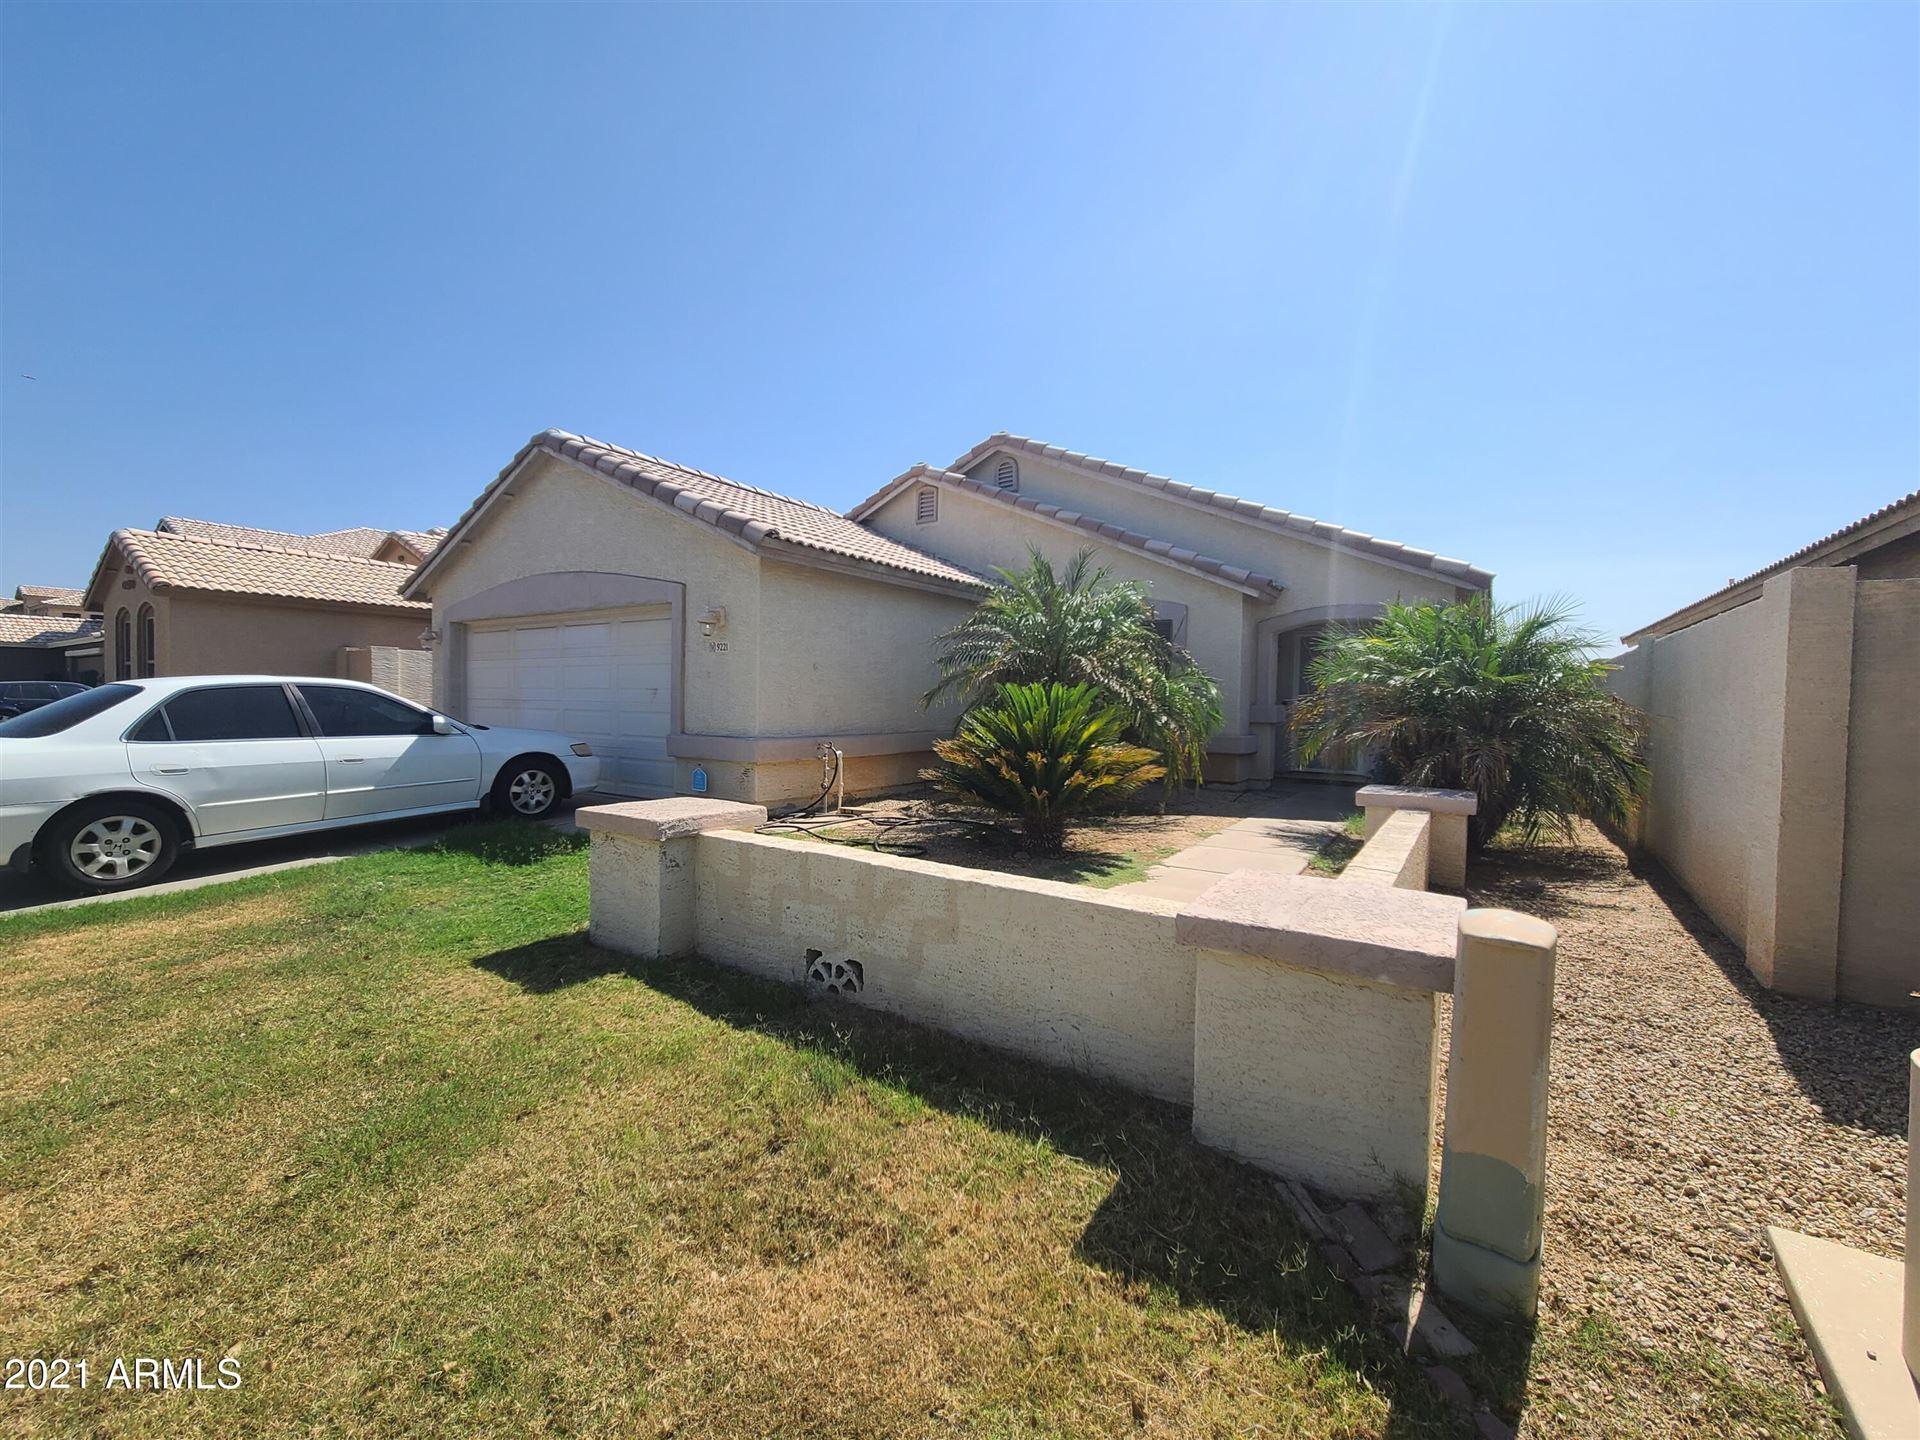 9221 W MACKENZIE Drive, Phoenix, AZ 85037 - MLS#: 6306862